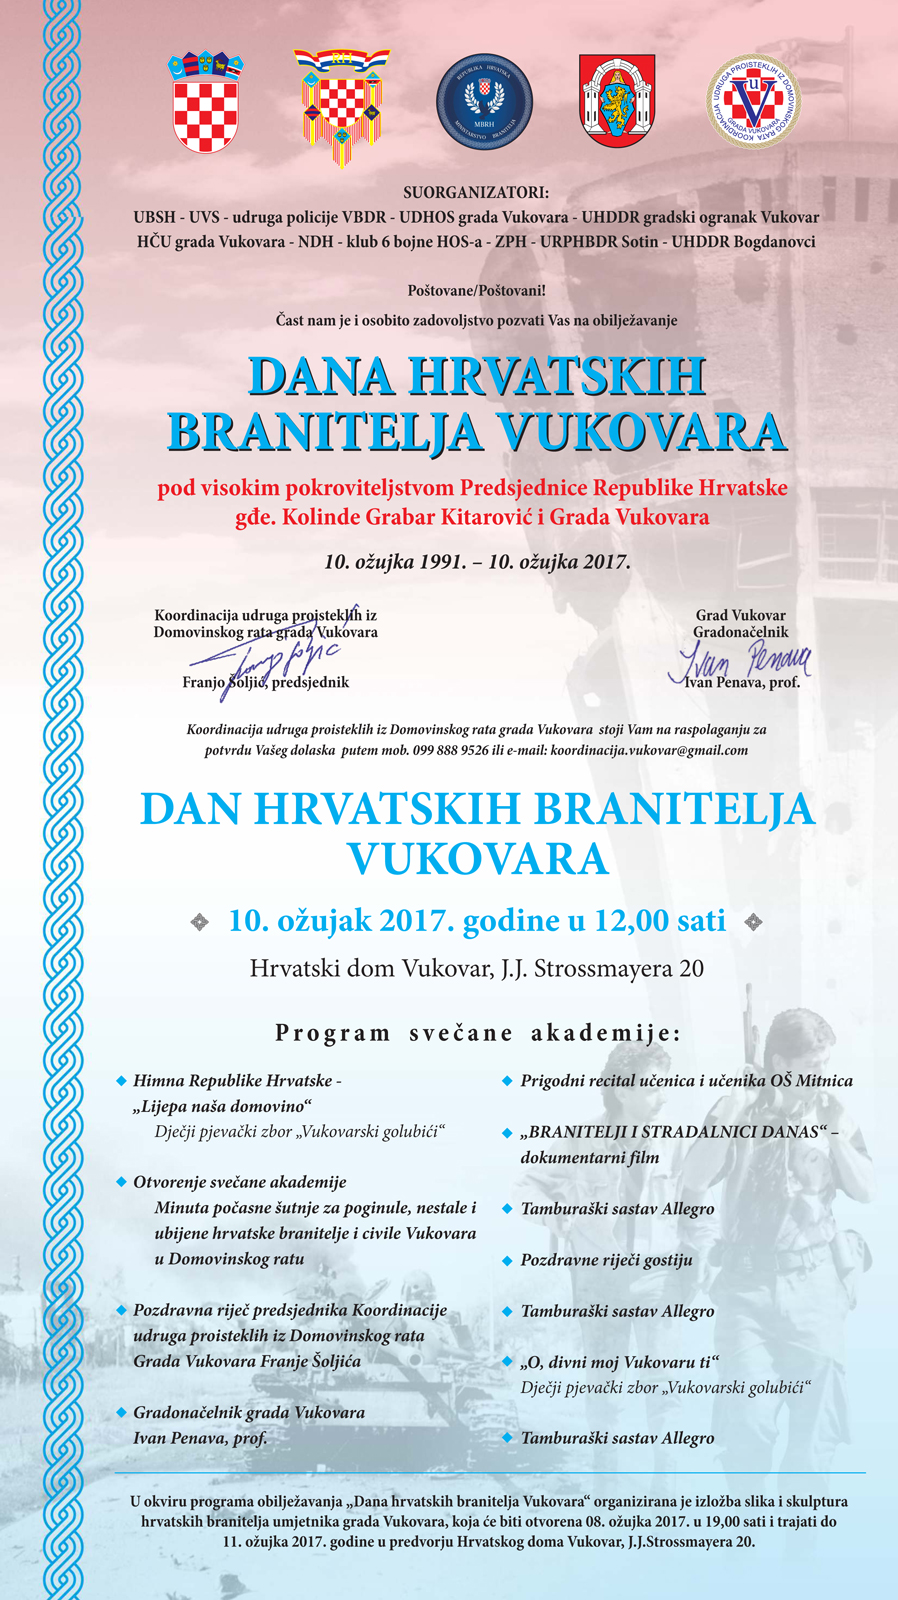 LokalnaHrvatska.hr Vukovar Dan hrvatskih branitelja-2017